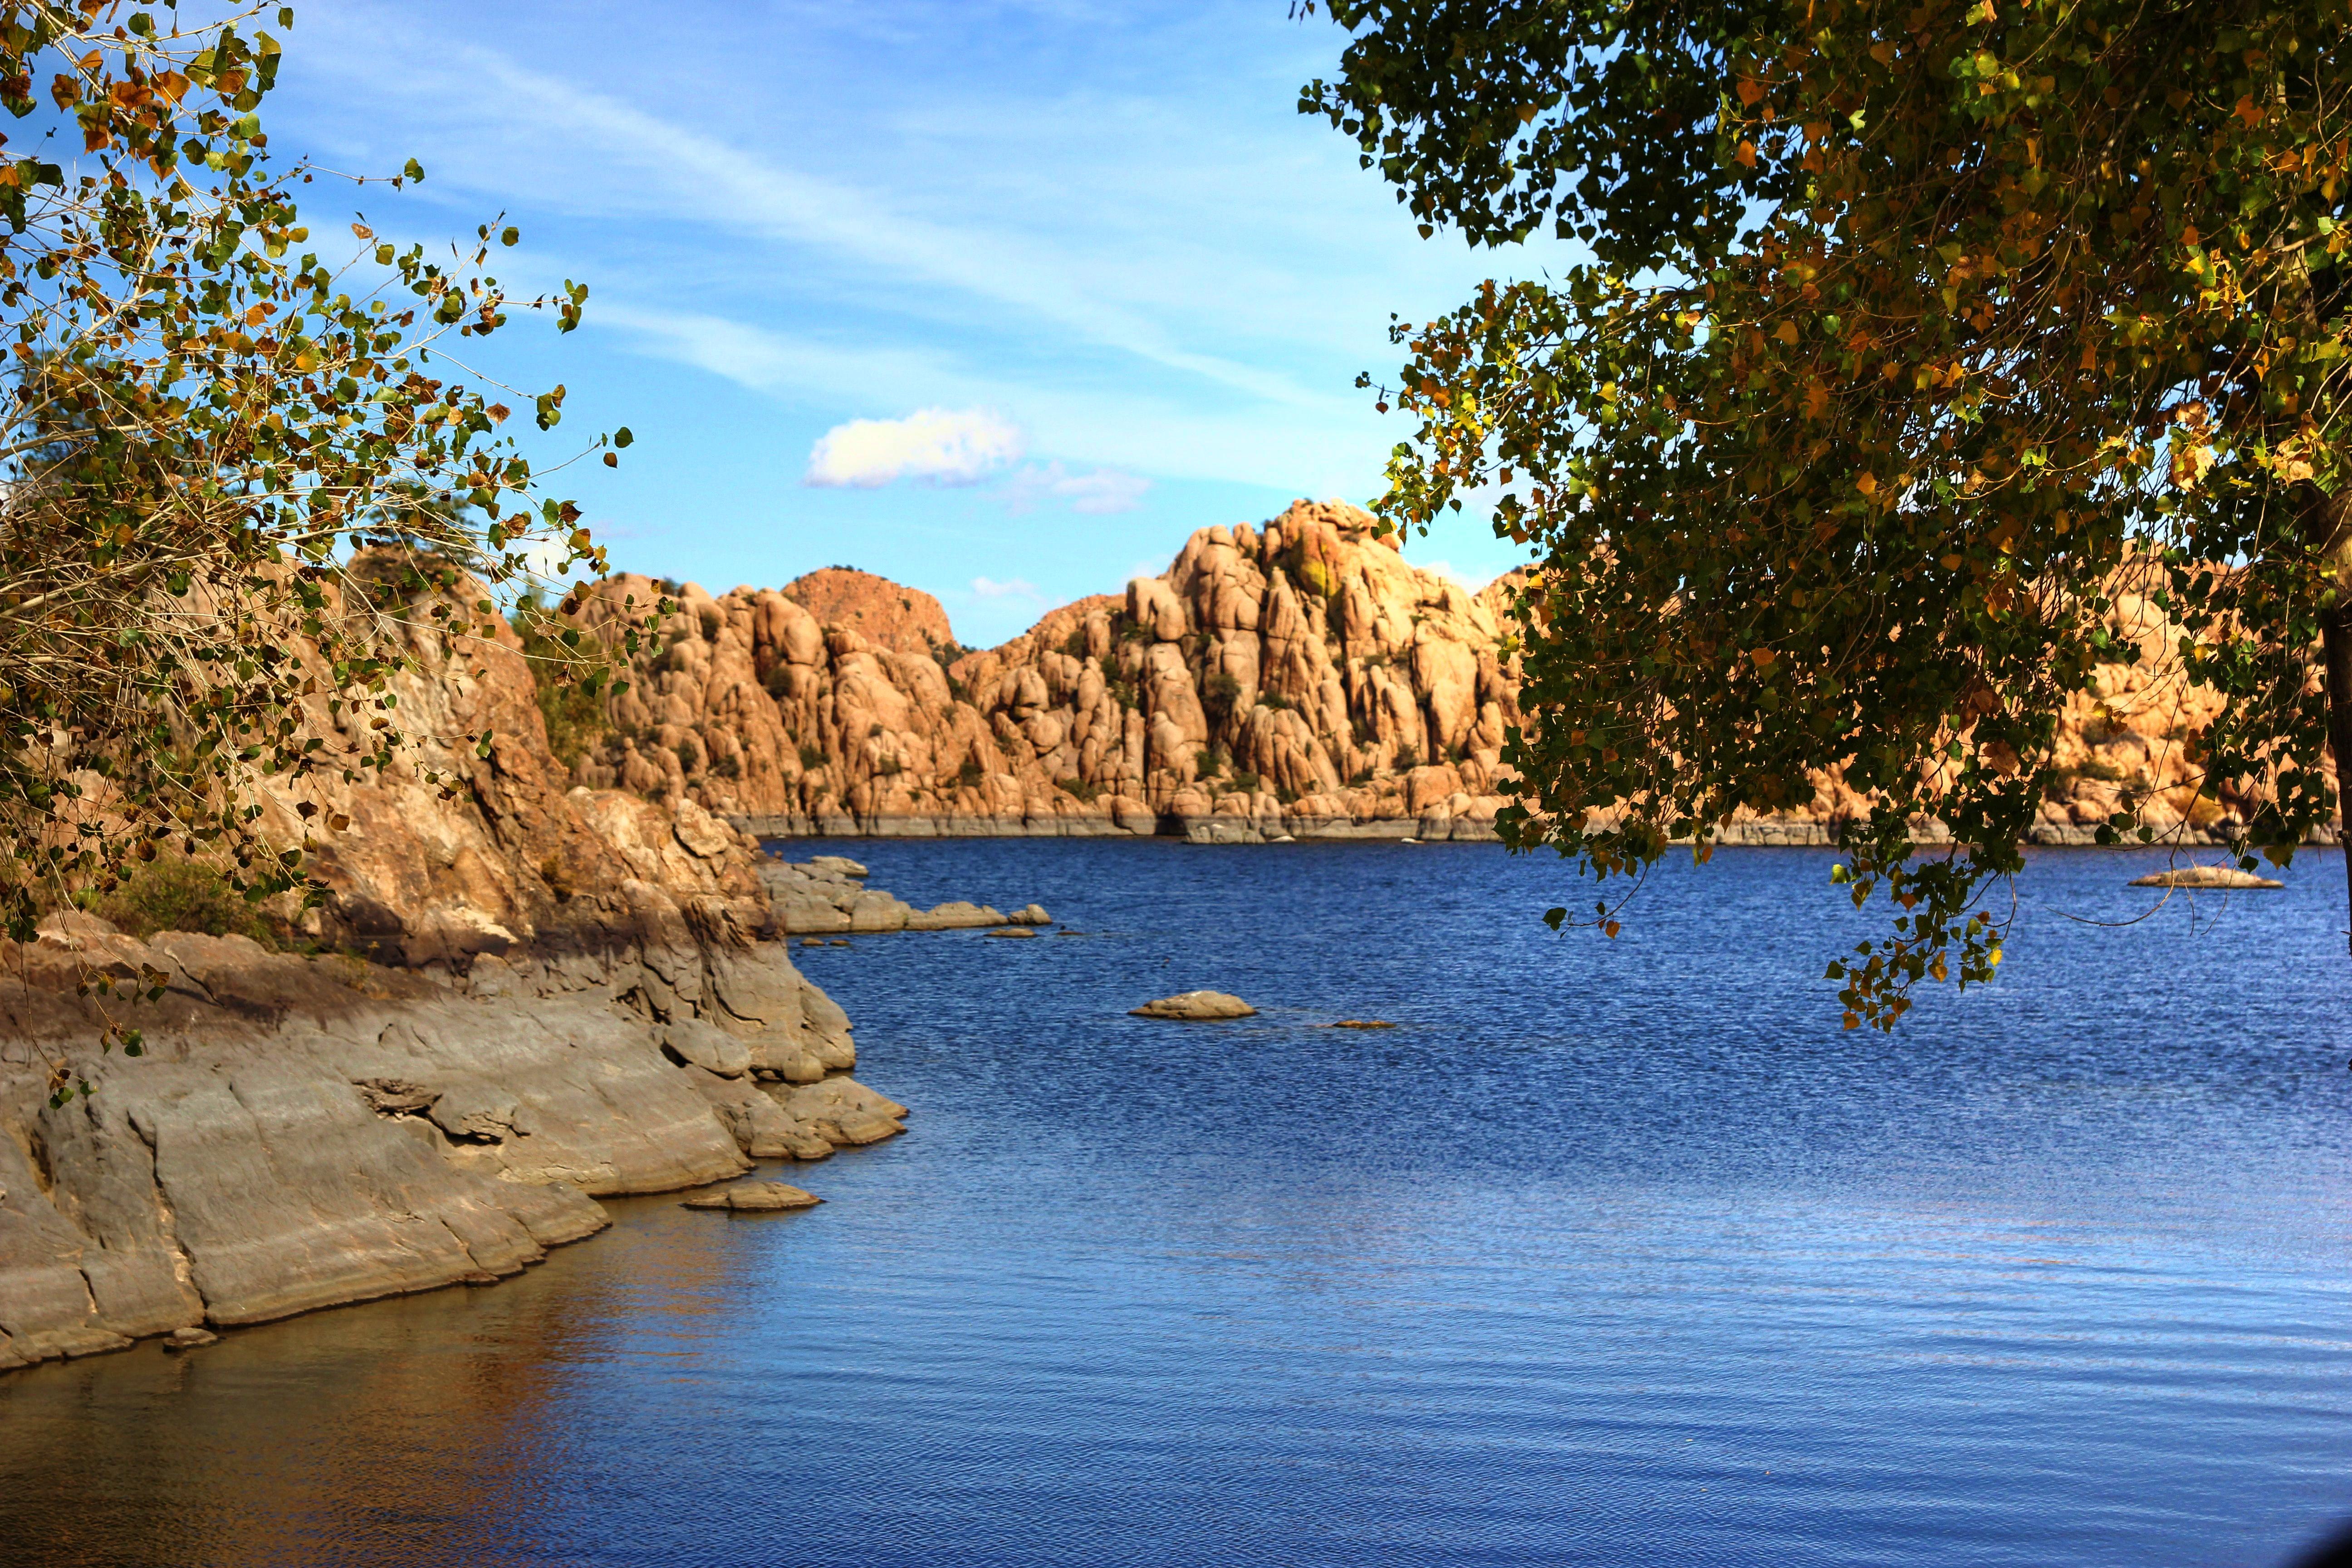 Arizona yavapai county yarnell - Soe Youmademyday